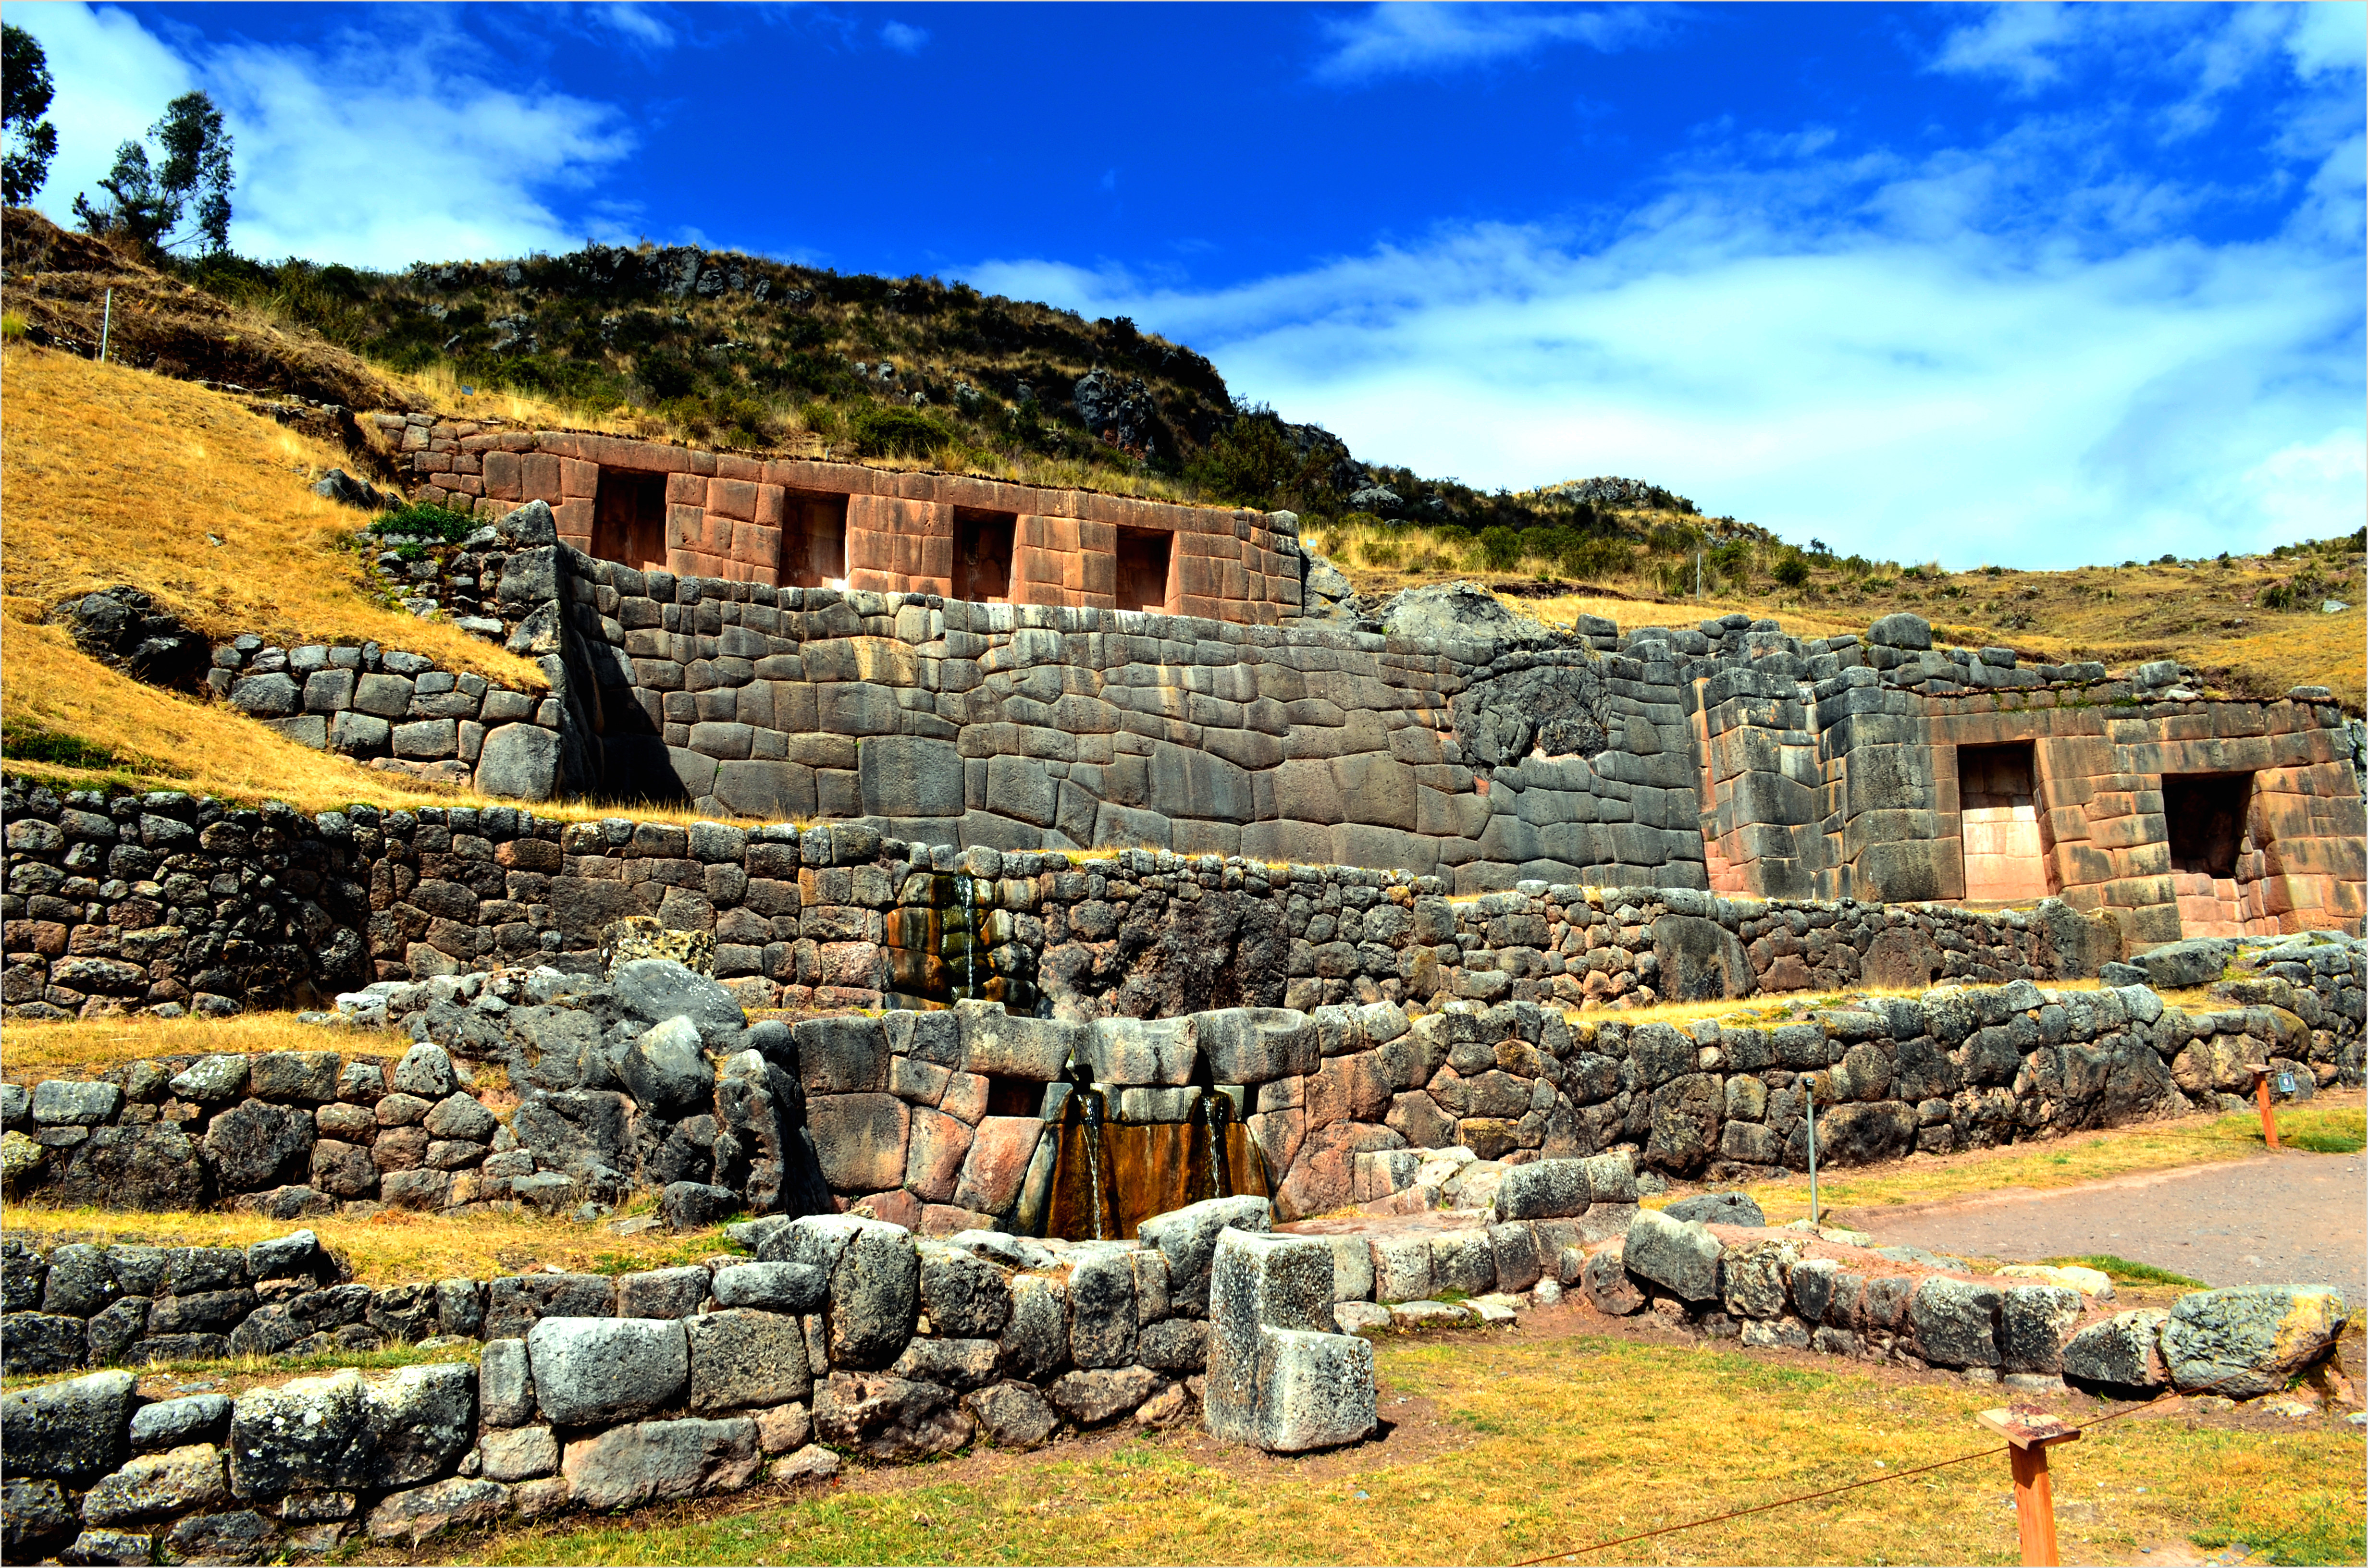 Modelo De Hoja De Vida Profesional 2019 Perº Lima Cuzco Machu Picchu Y Puno